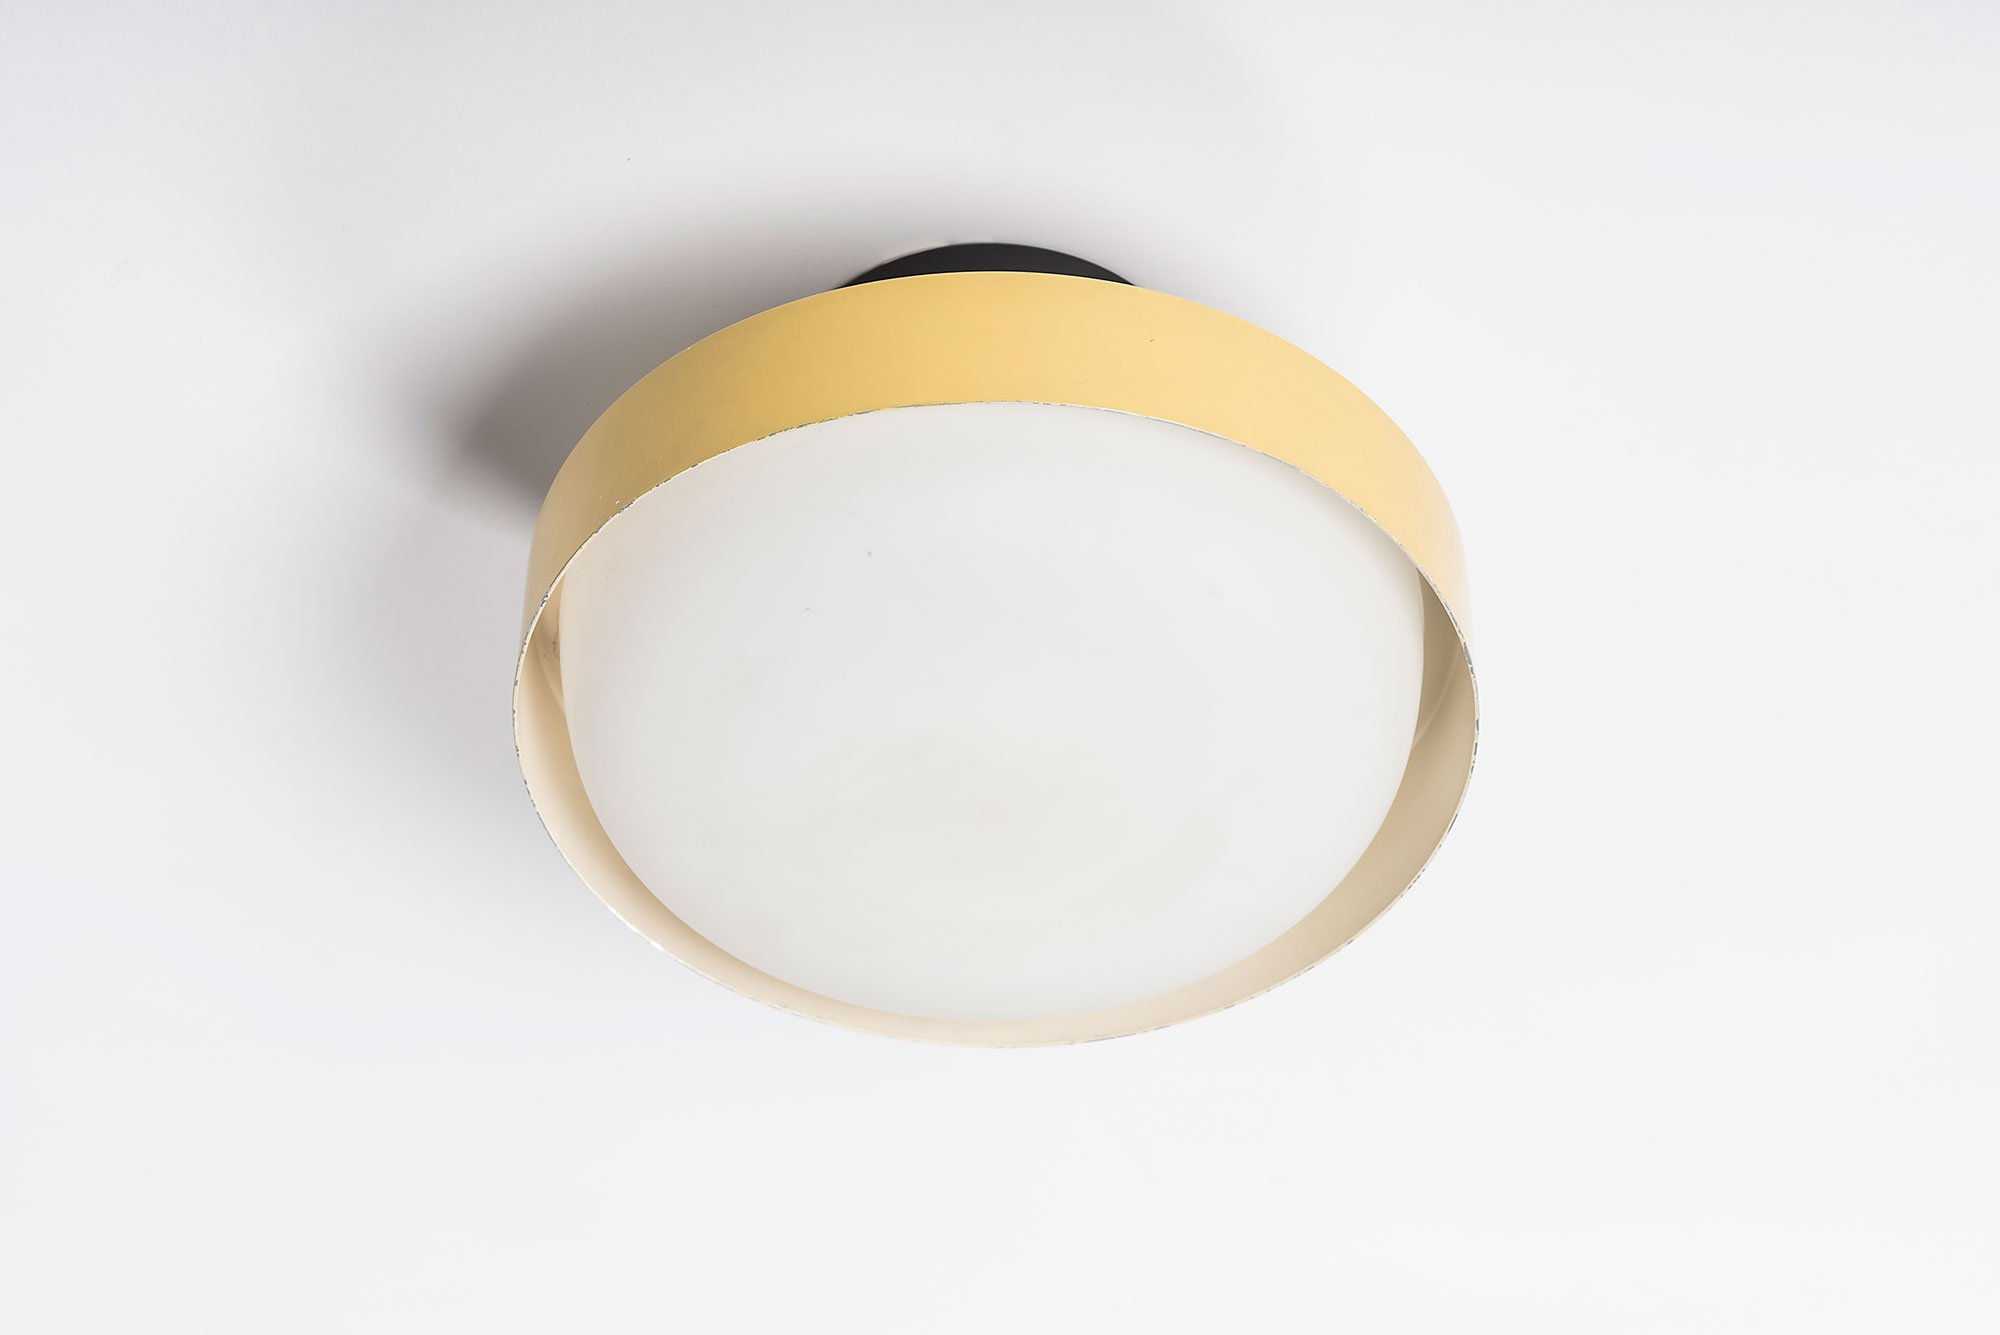 Gino Sarfatti |  Ceiling light model 3010